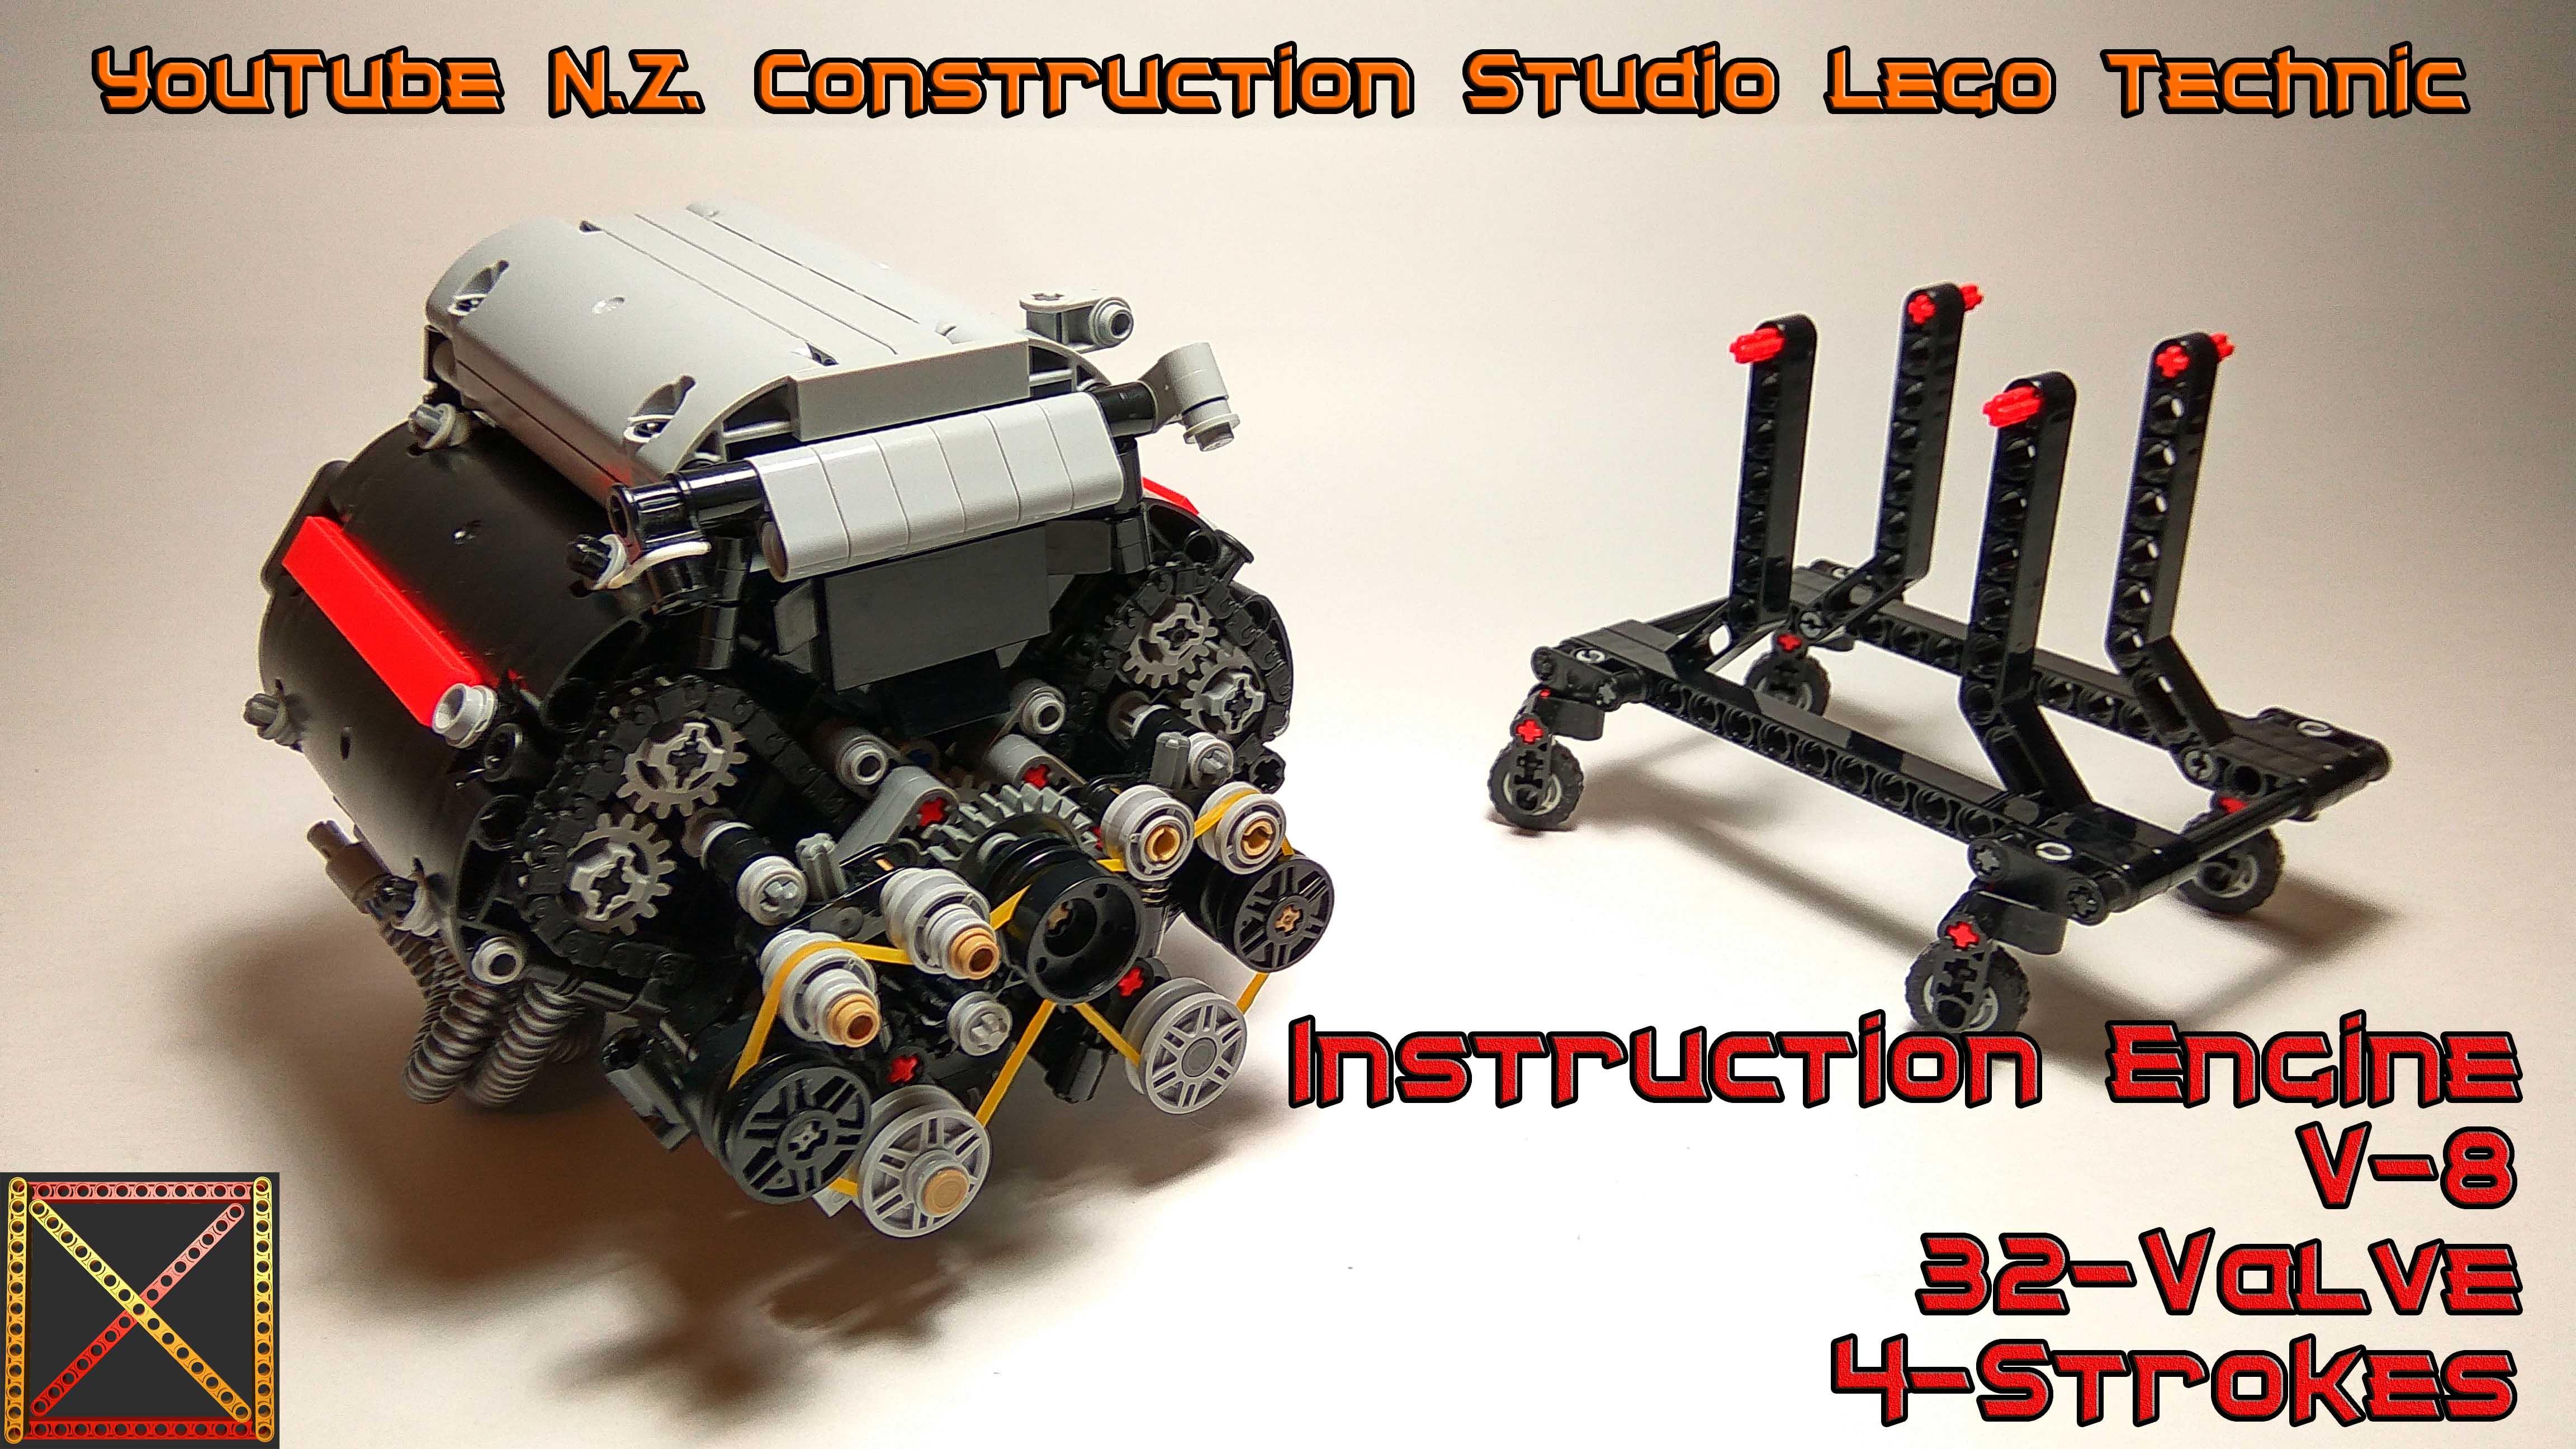 Instruction V 8 Engine 32 Valve Lego Technic Bricksafe